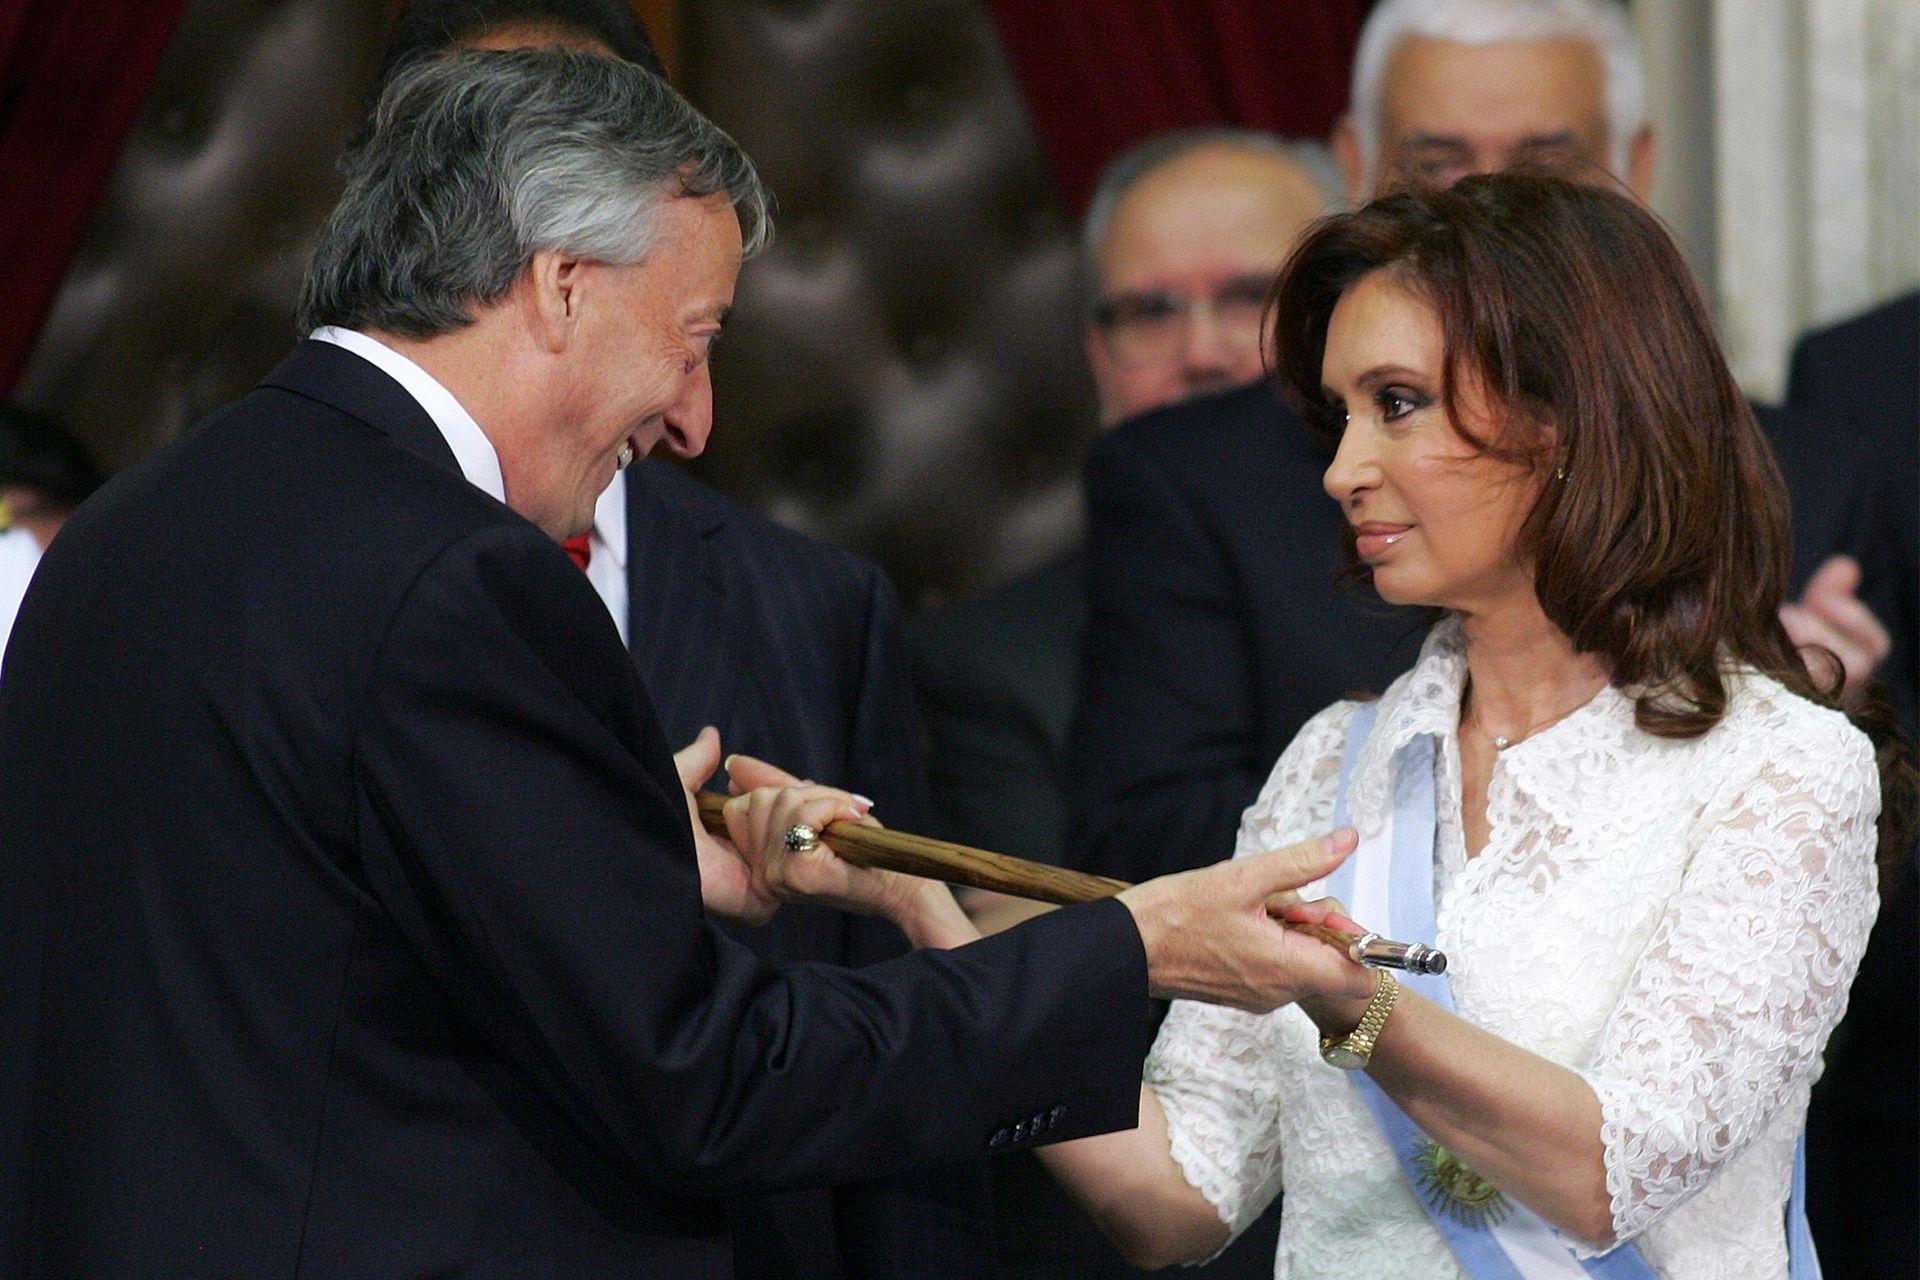 El 10 de Diciembre de 2007, el traspaso de mando de Néstor Kirchner a su esposa Cristina